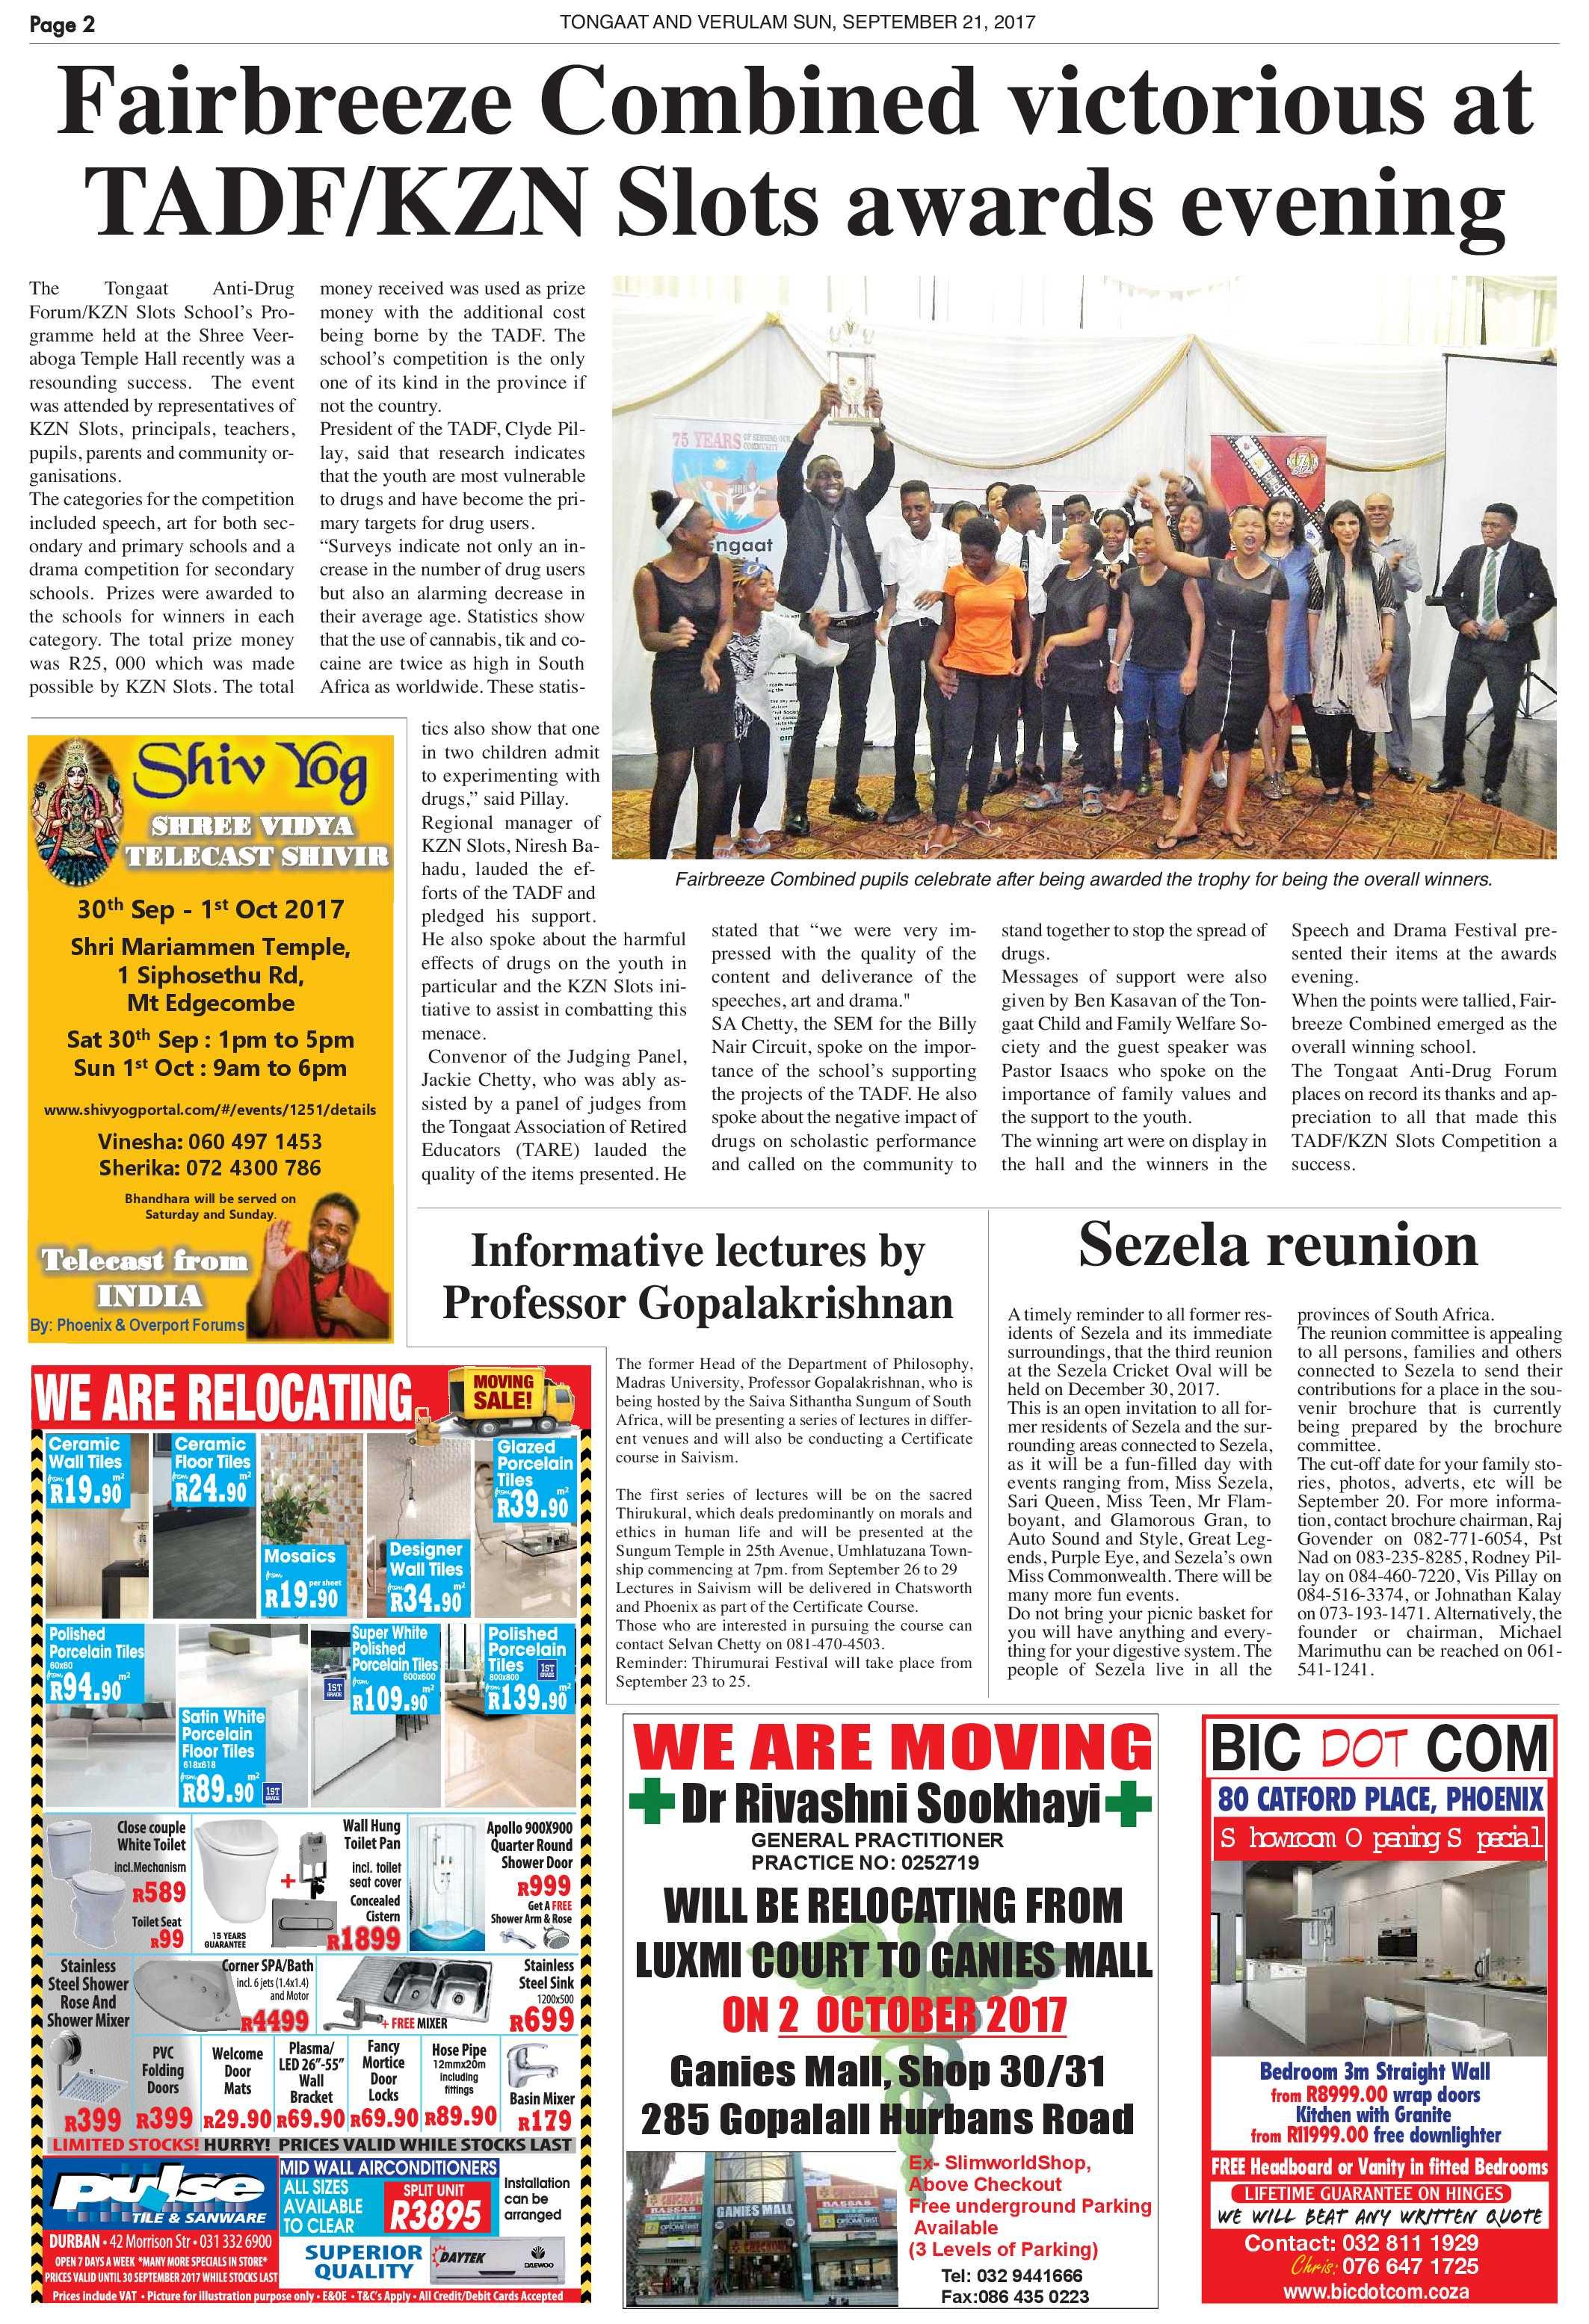 tongaat-verulam-sun-september-21-epapers-page-2